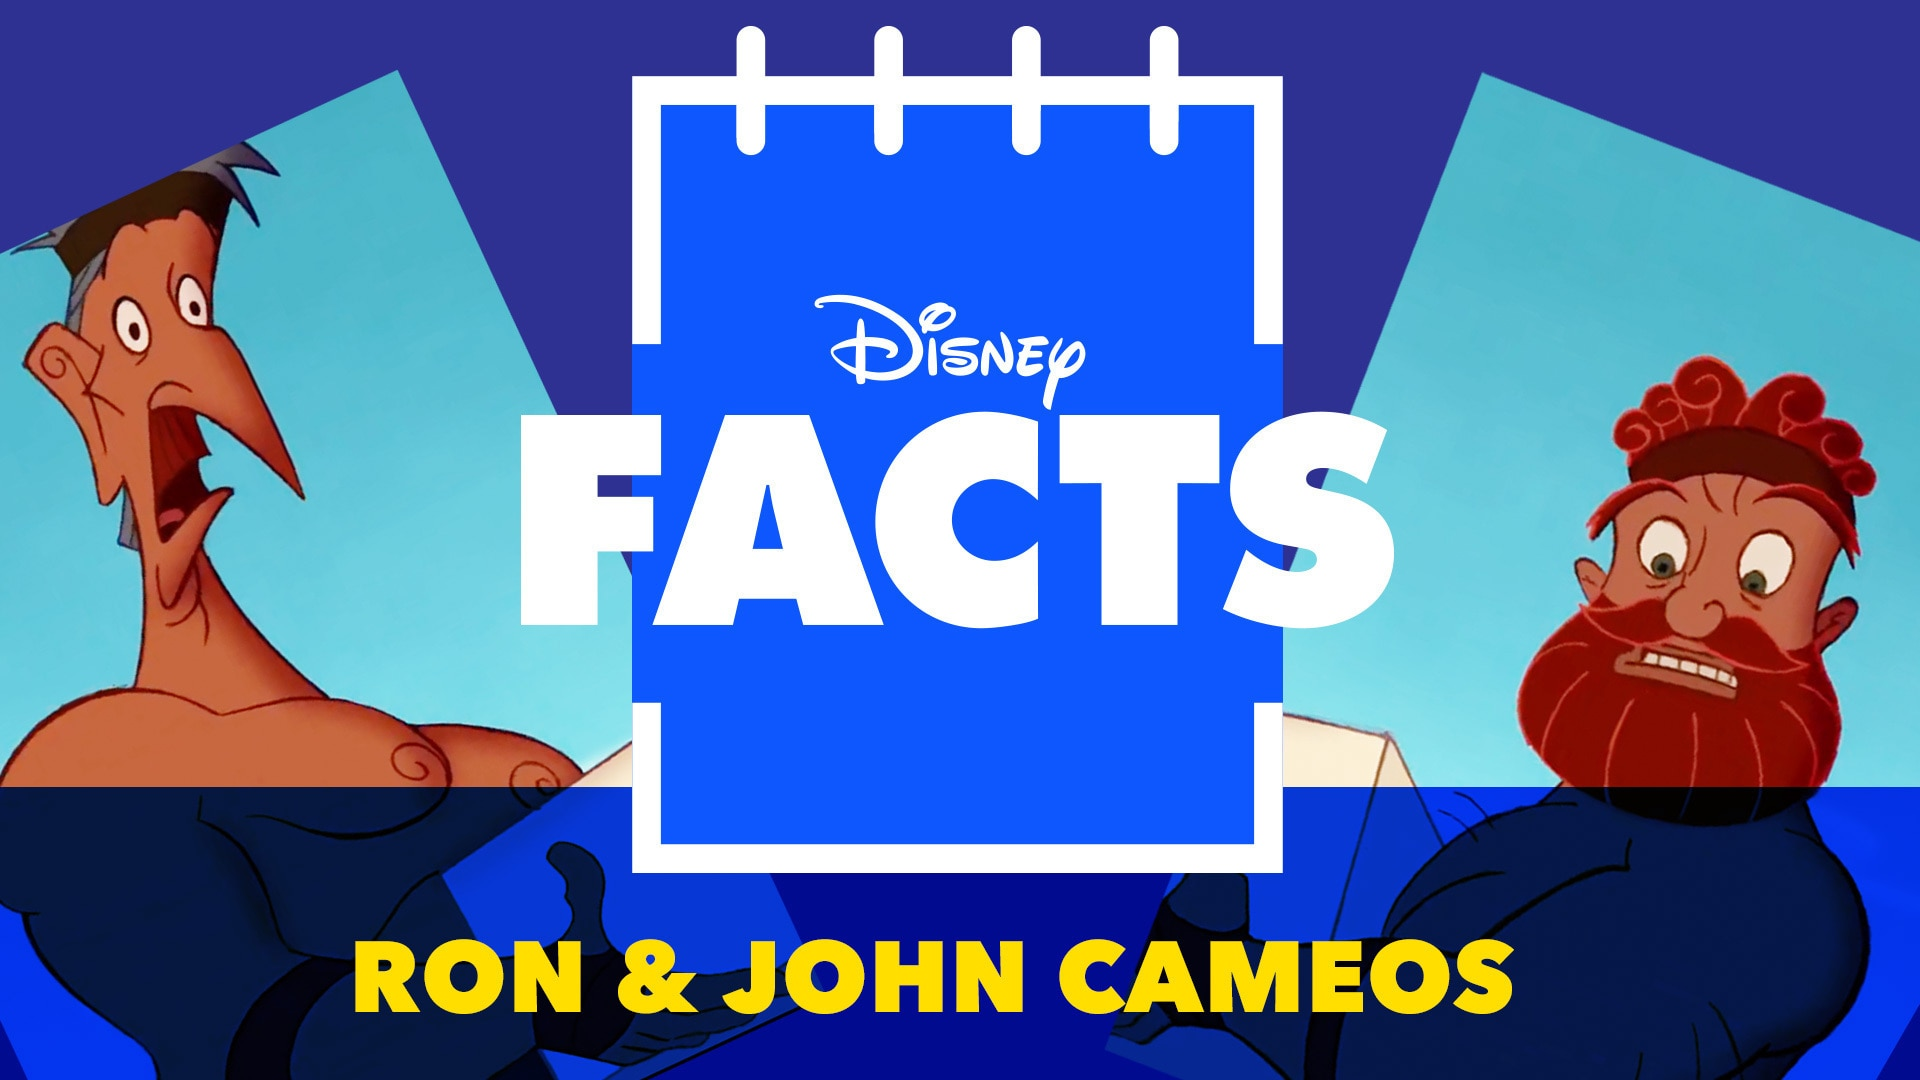 Disney Facts | Every Ron & John Cameo in Disney Films